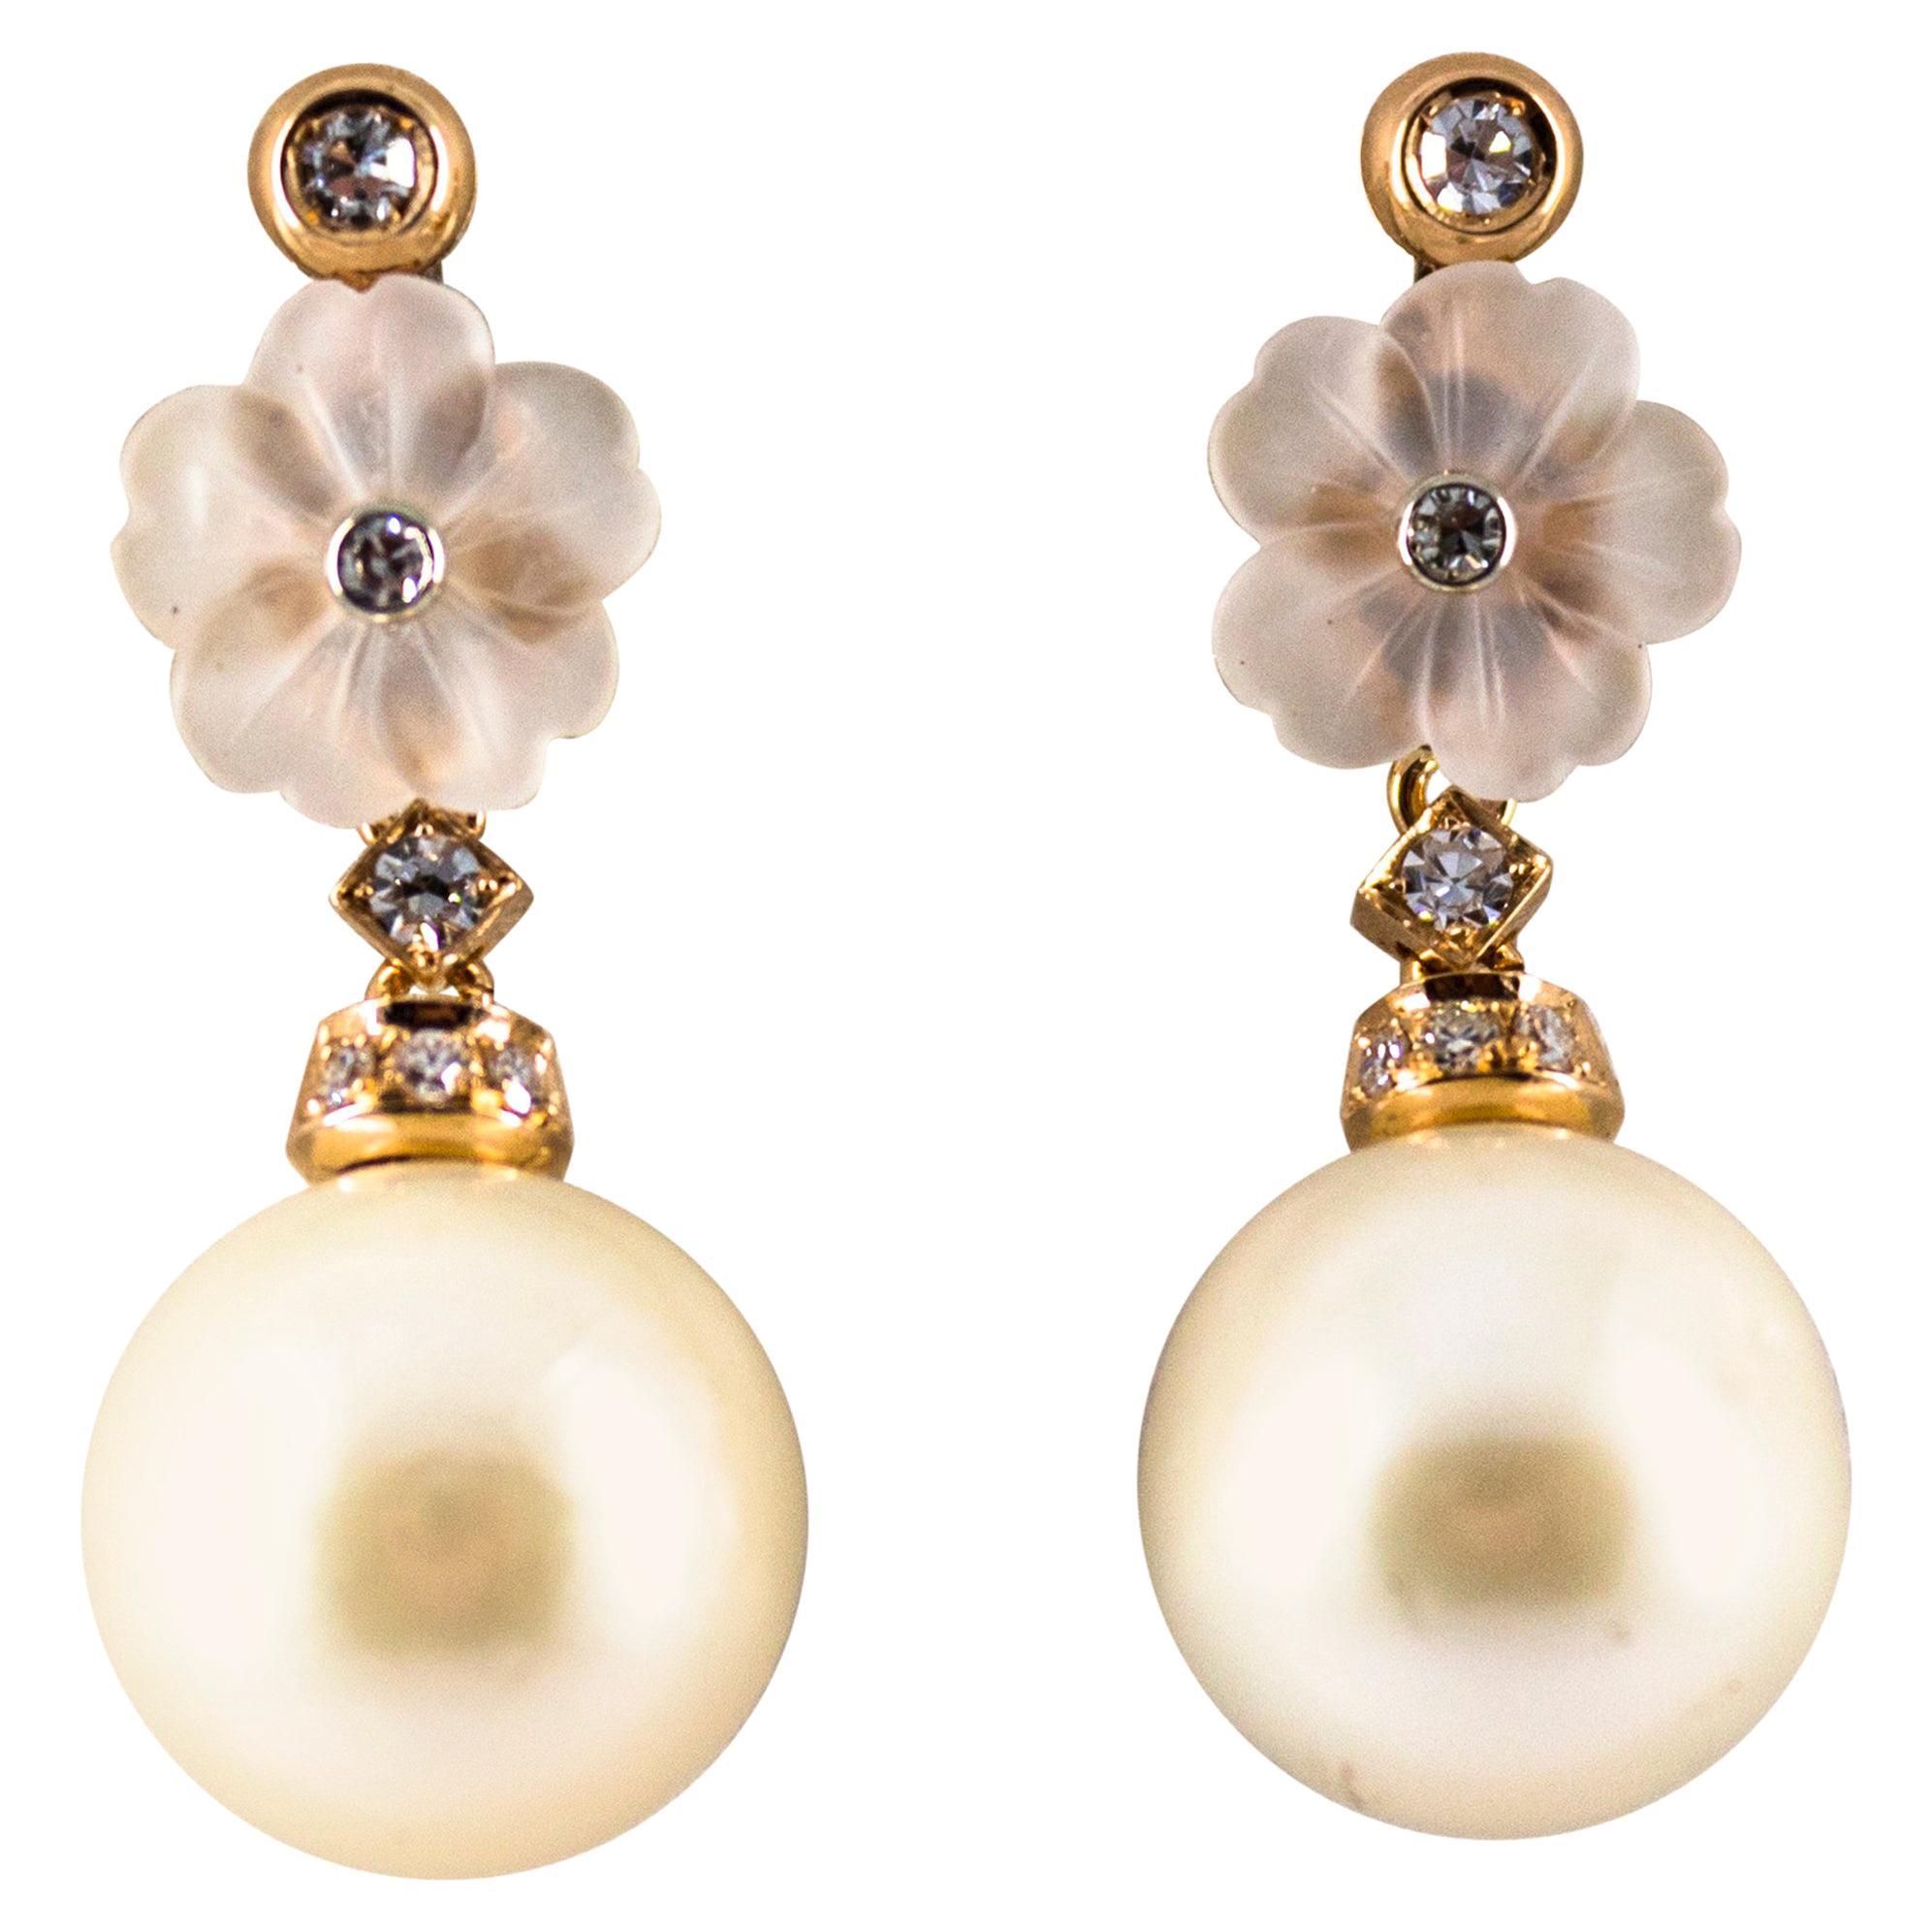 Art Nouveau 0.20 Carat White Diamond Rock Crystal Pearl Yellow Gold Earrings